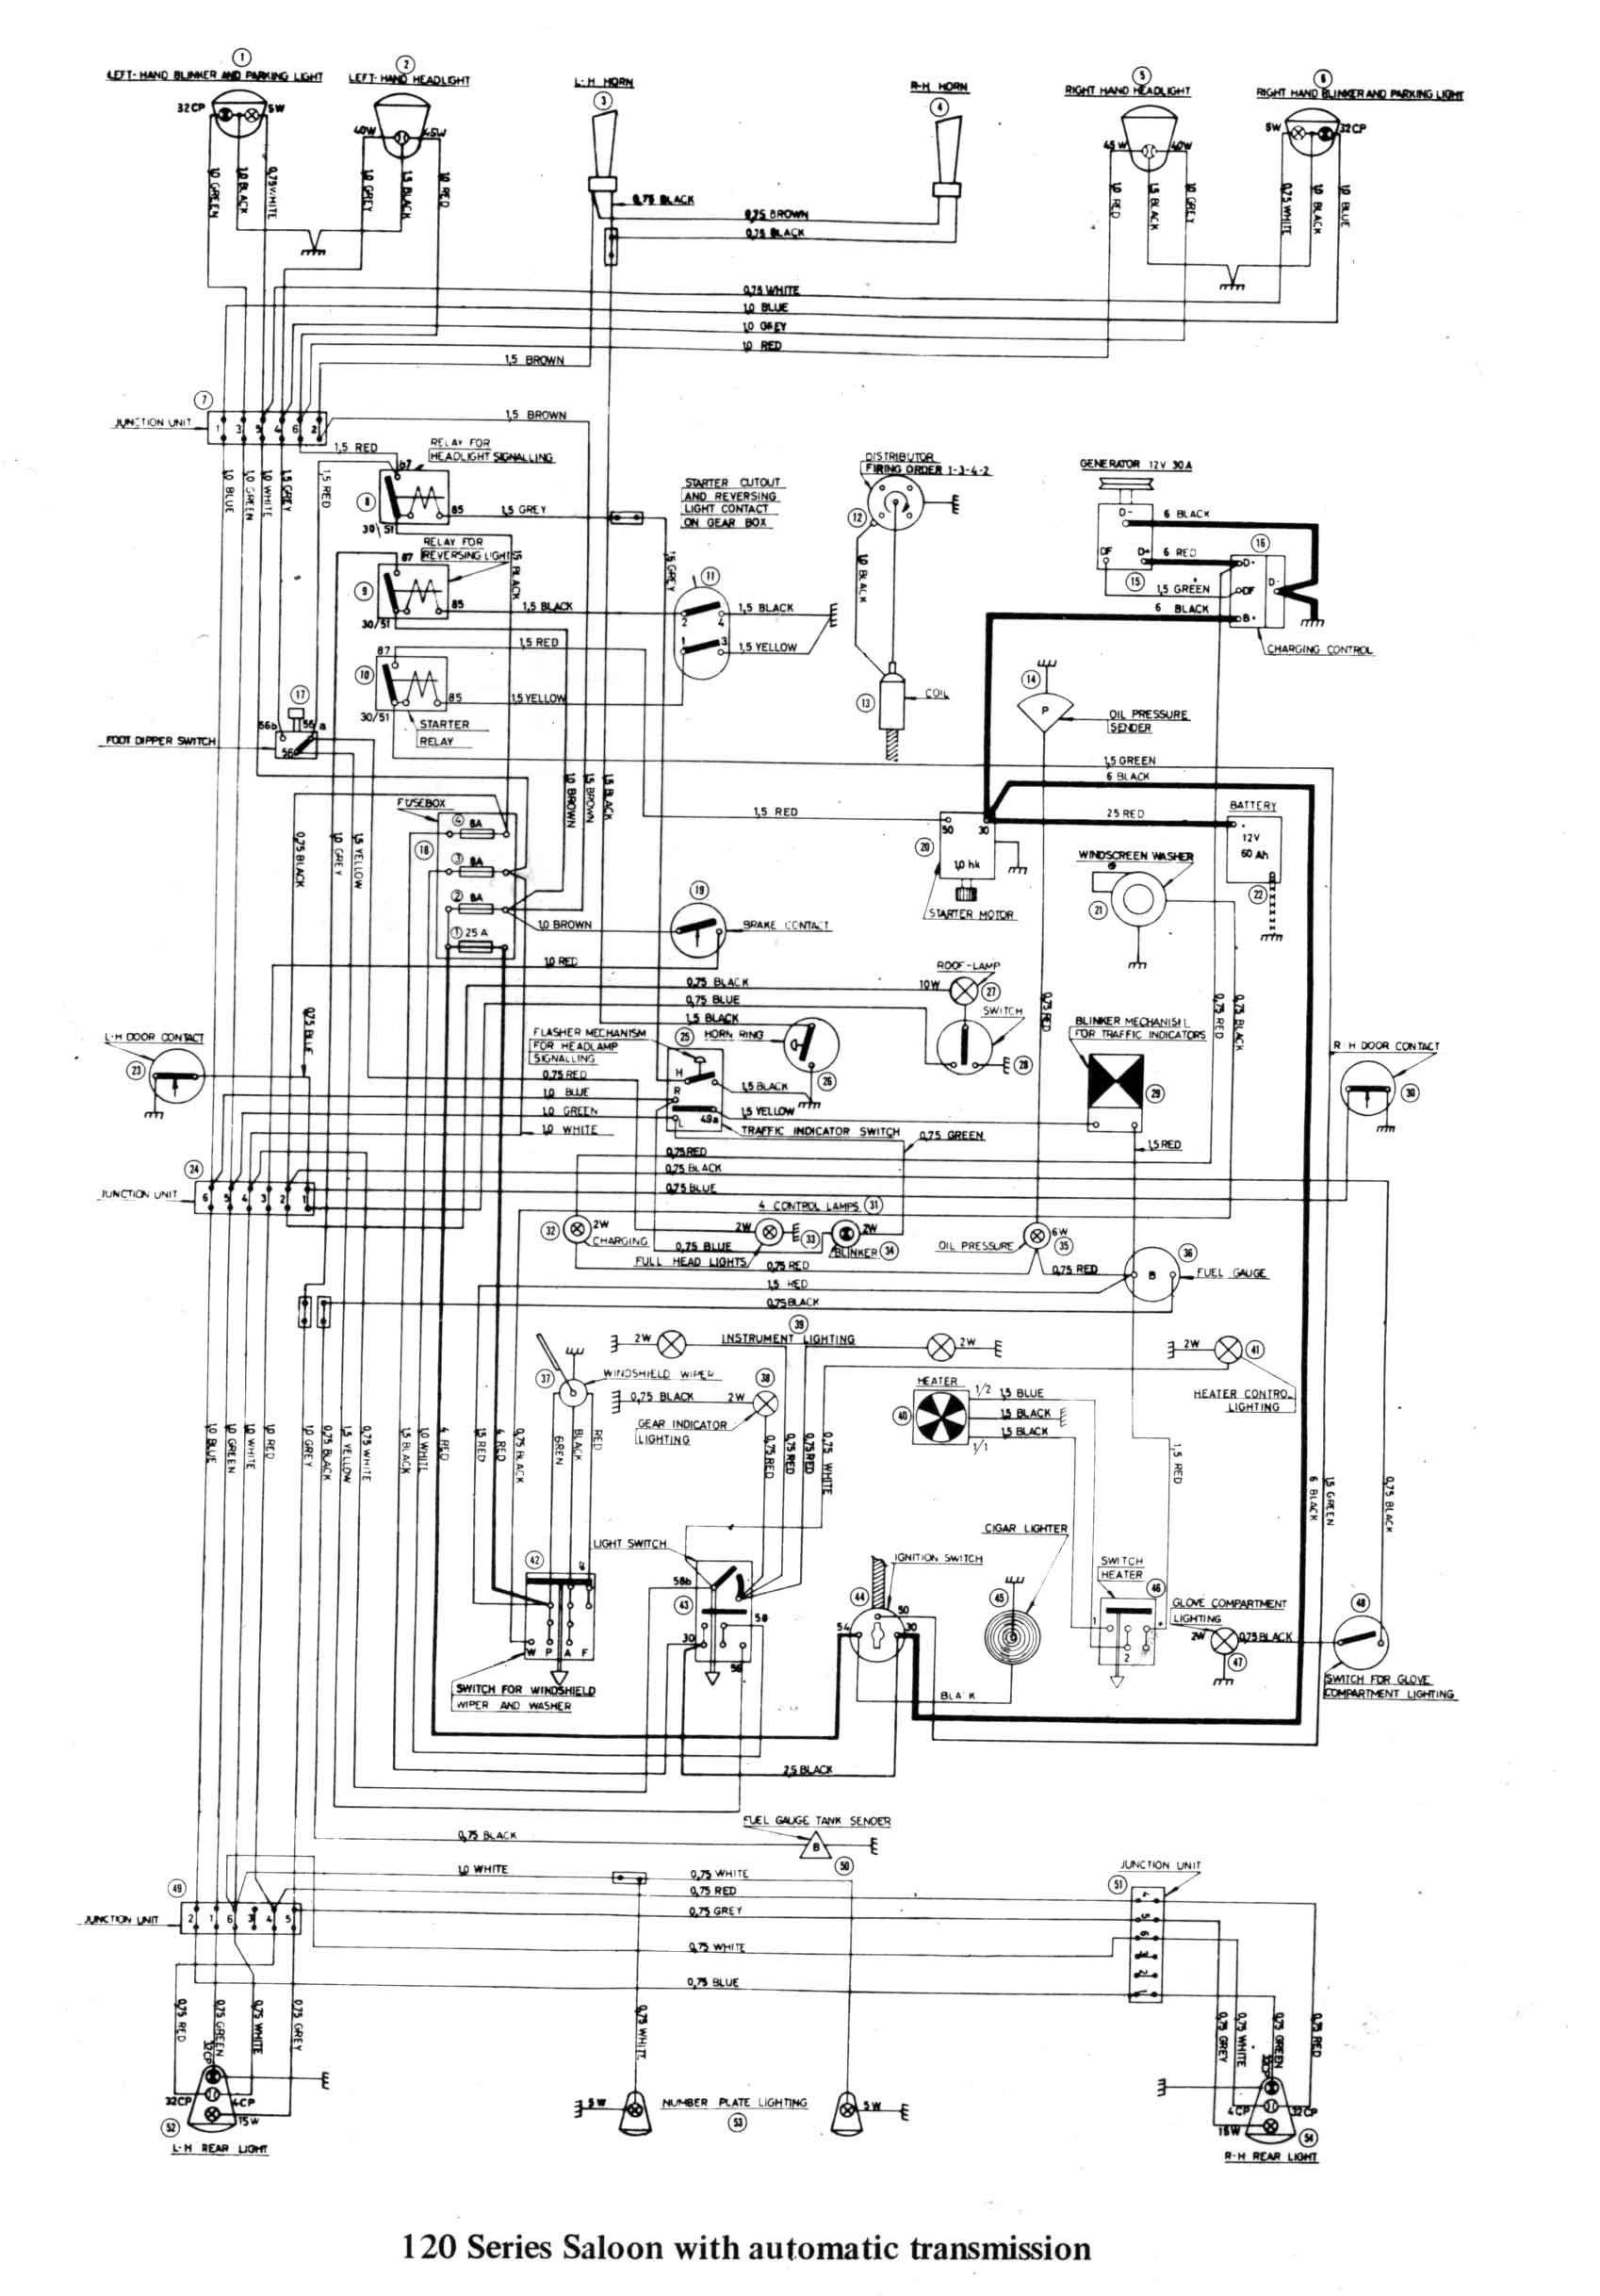 Nissan Murano Engine Diagram 8deaa Borg Warner Actuator Wiring Diagram Of Nissan Murano Engine Diagram